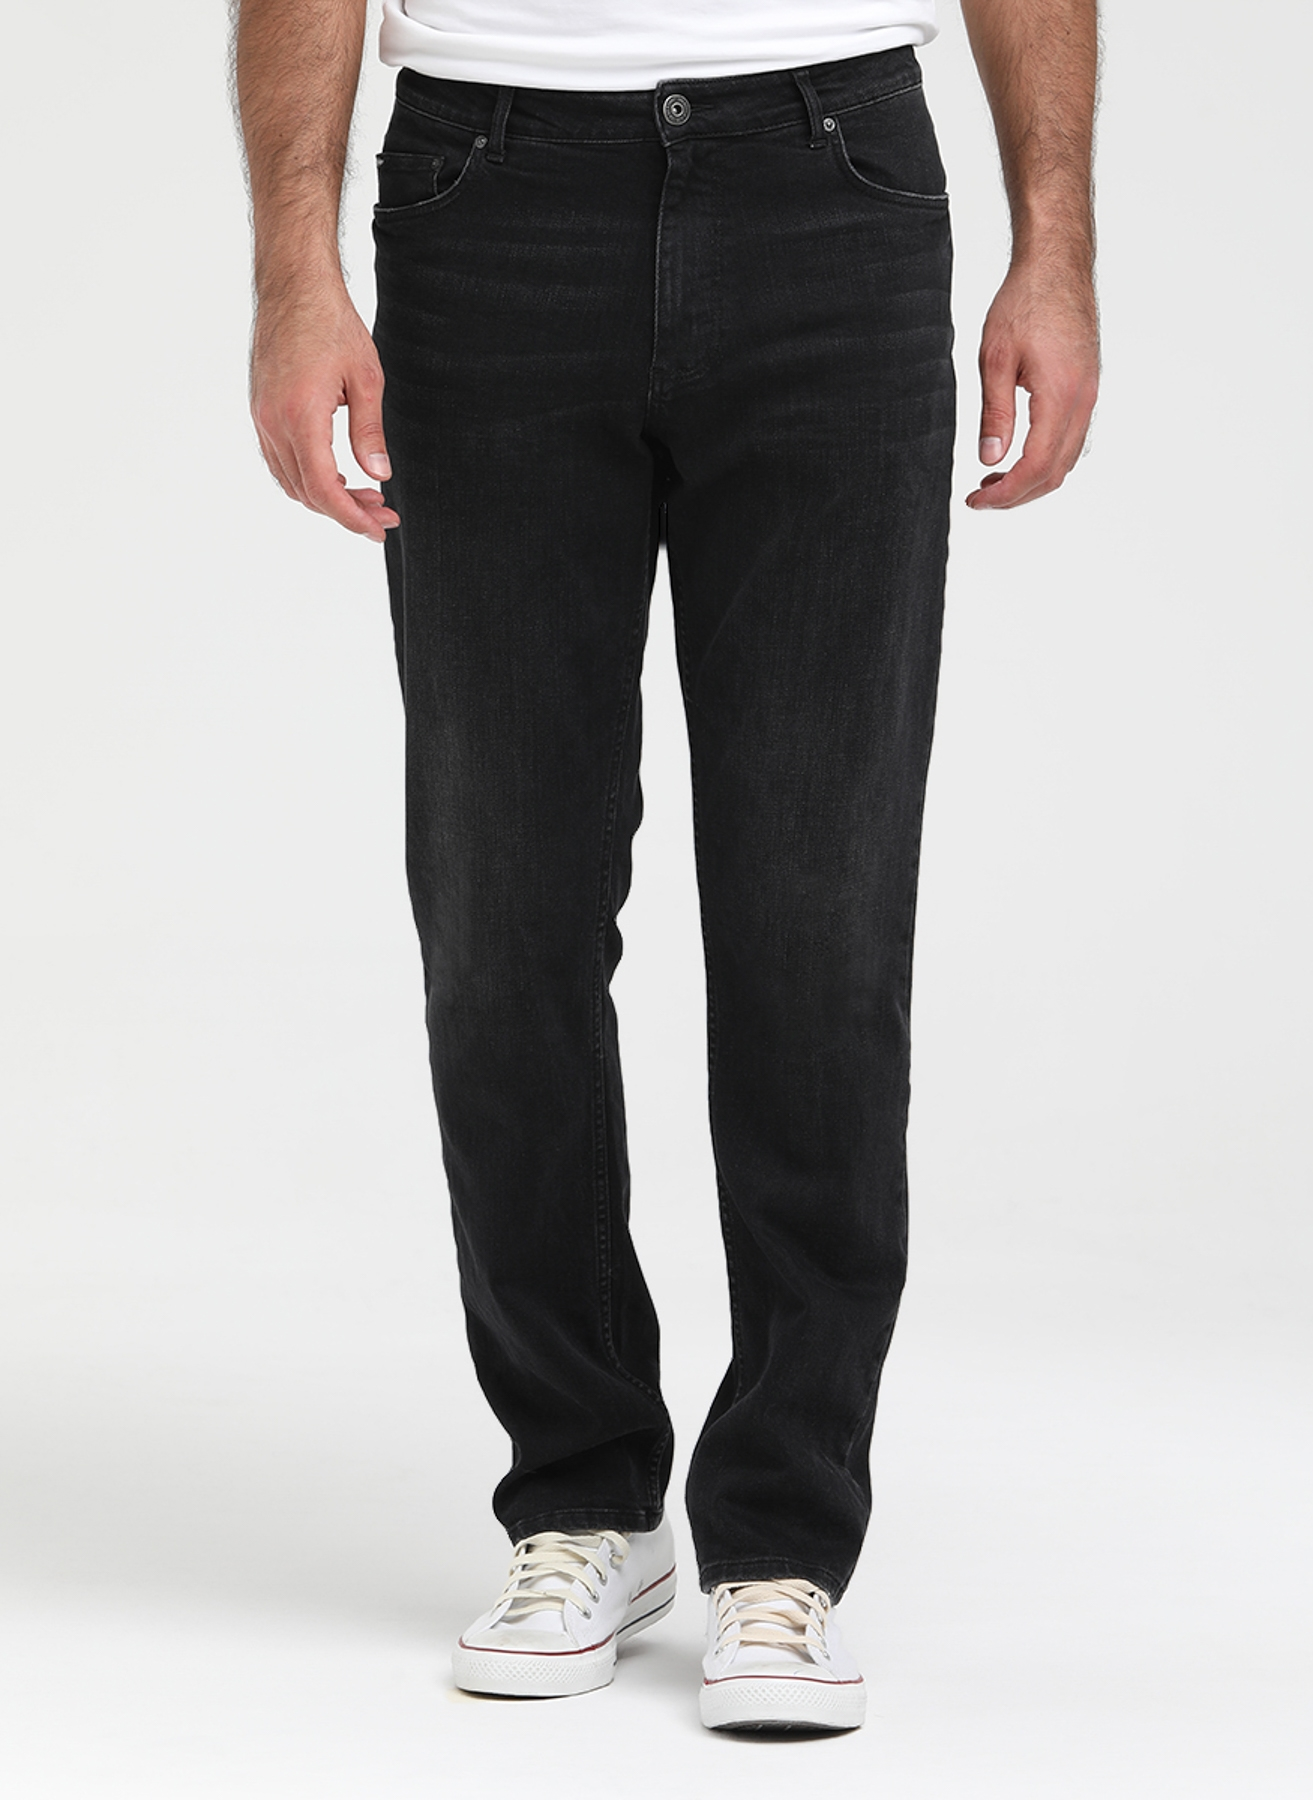 Lee Cooper Harry Klasik Pantolon 32-34 5000200241008 Ürün Resmi